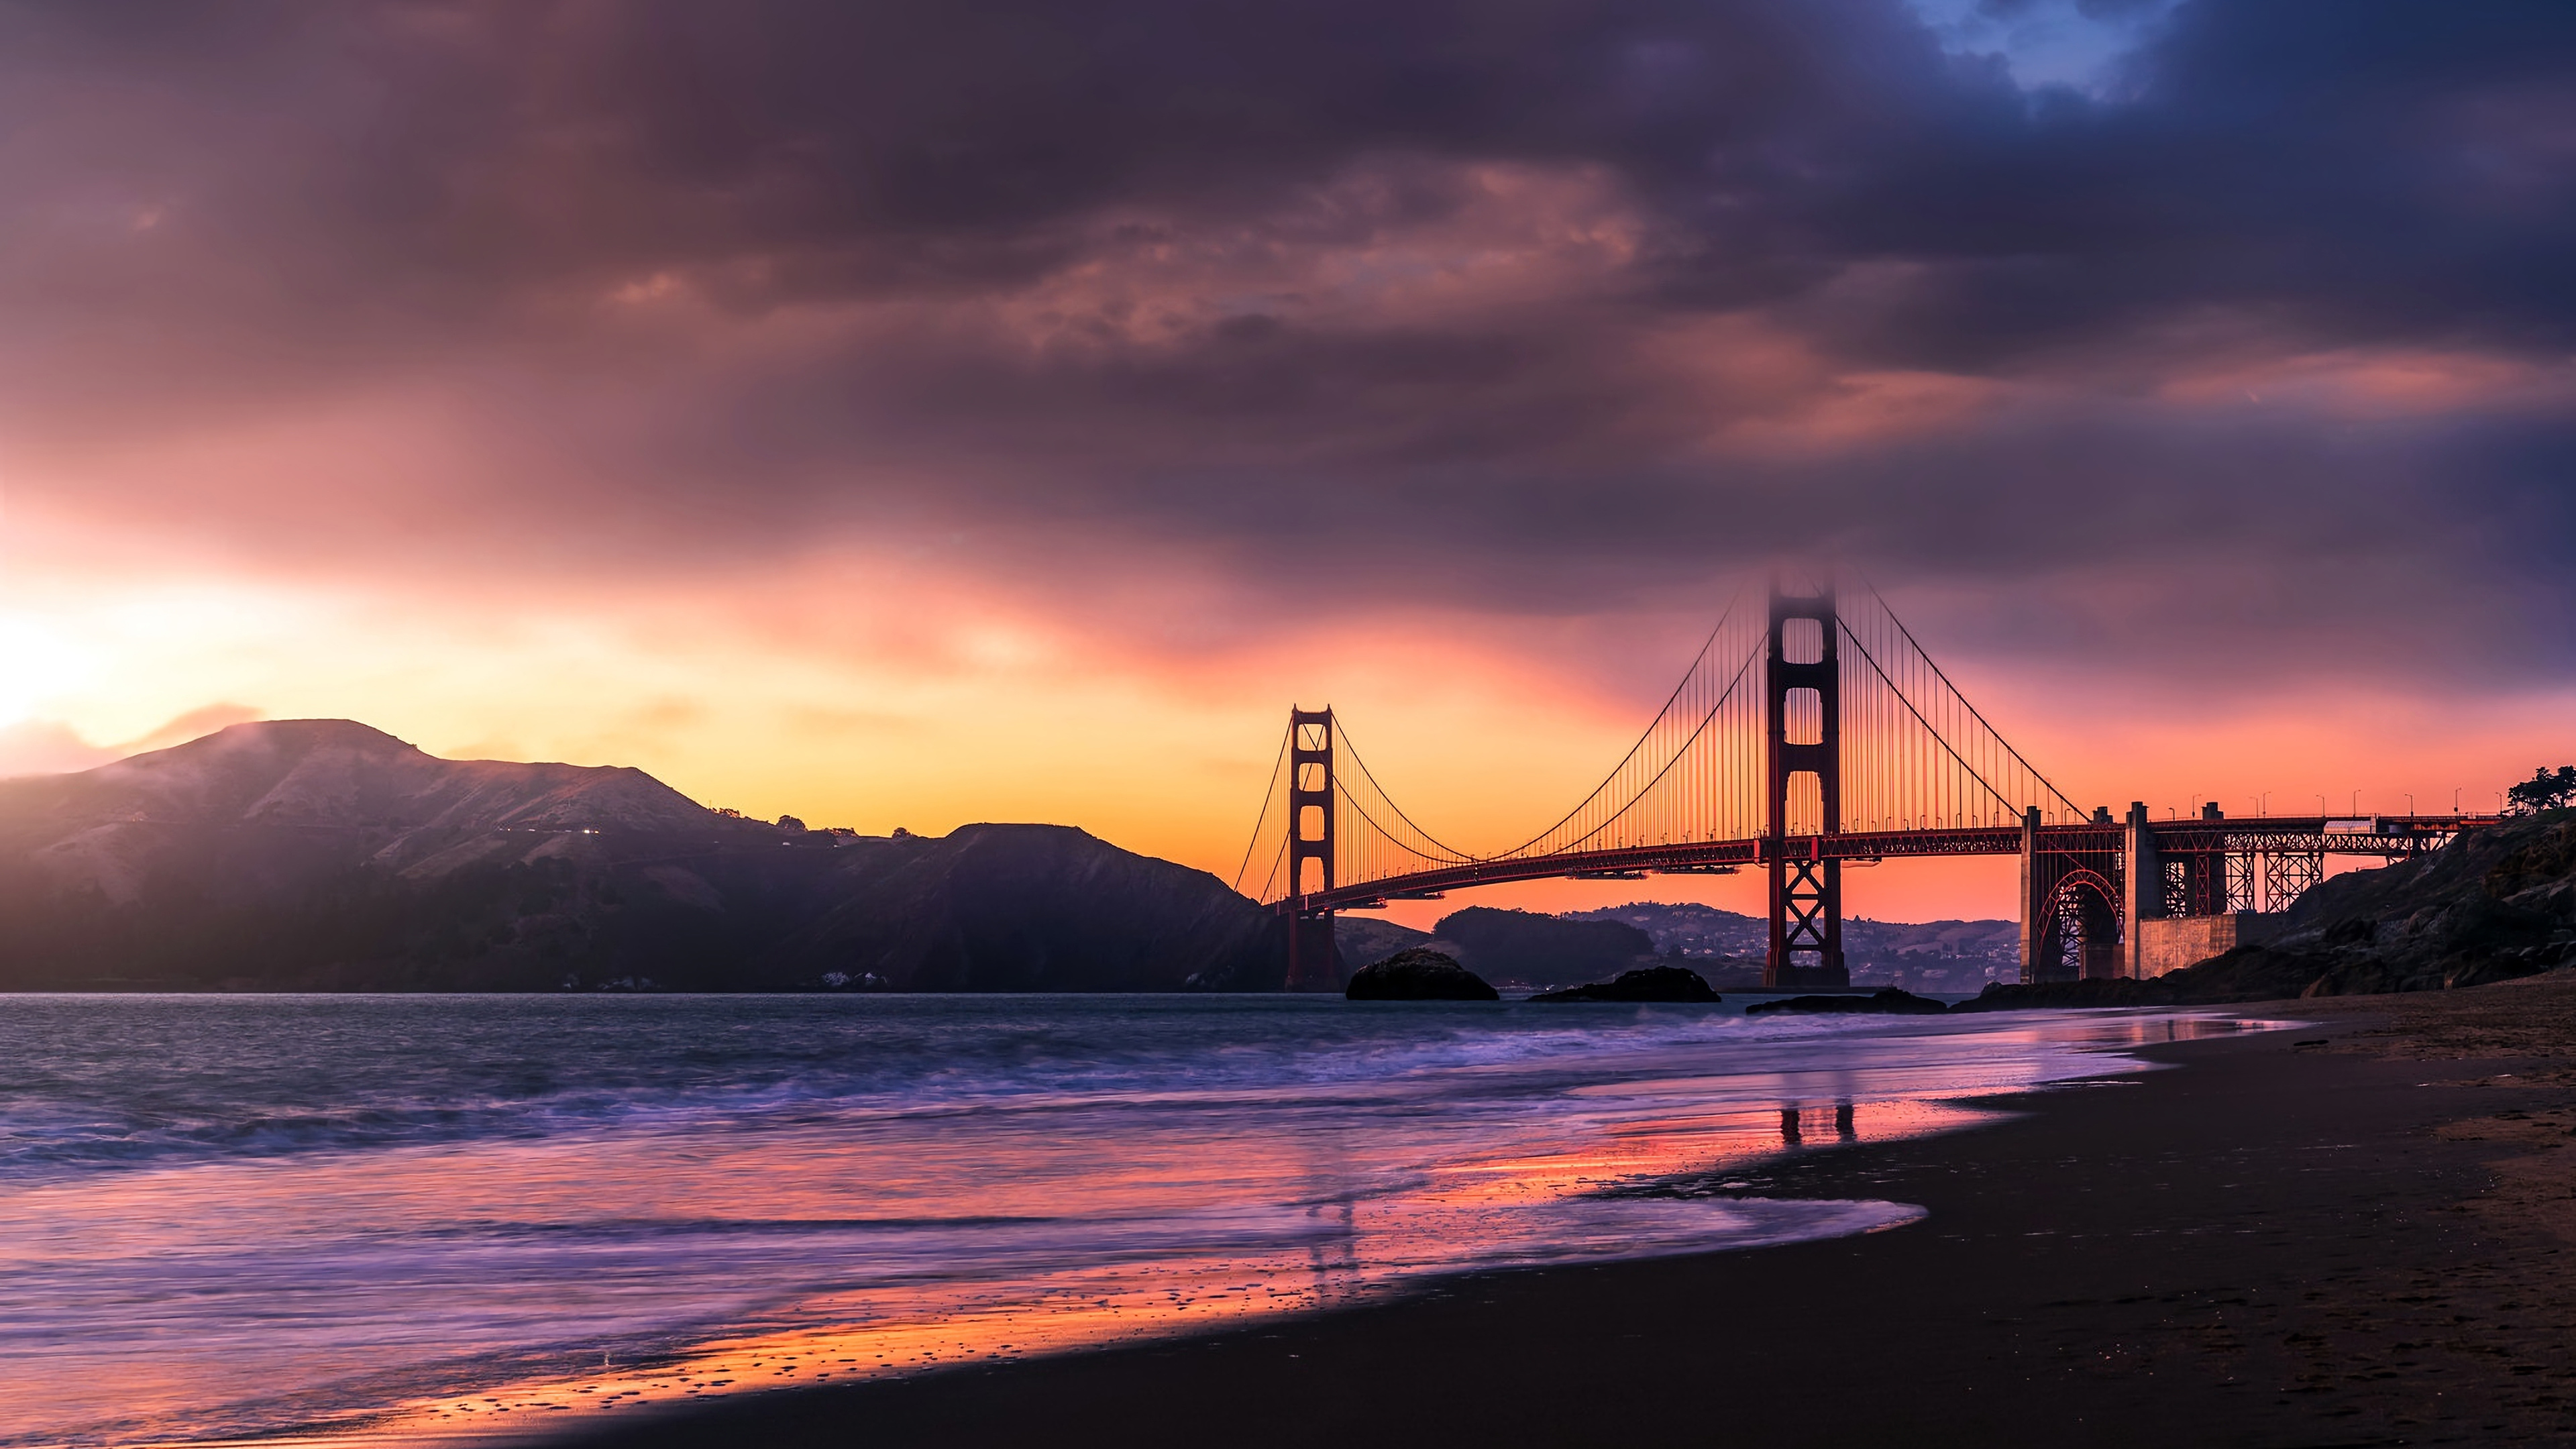 Wallpaper 4k Golden Gate Bridge Sanfrancicso 4k Wallpapers Bridge Wallpapers Golden Gate Bridge Wallpapers Hd Wallpapers San Francisco Wallpapers World Wallpapers